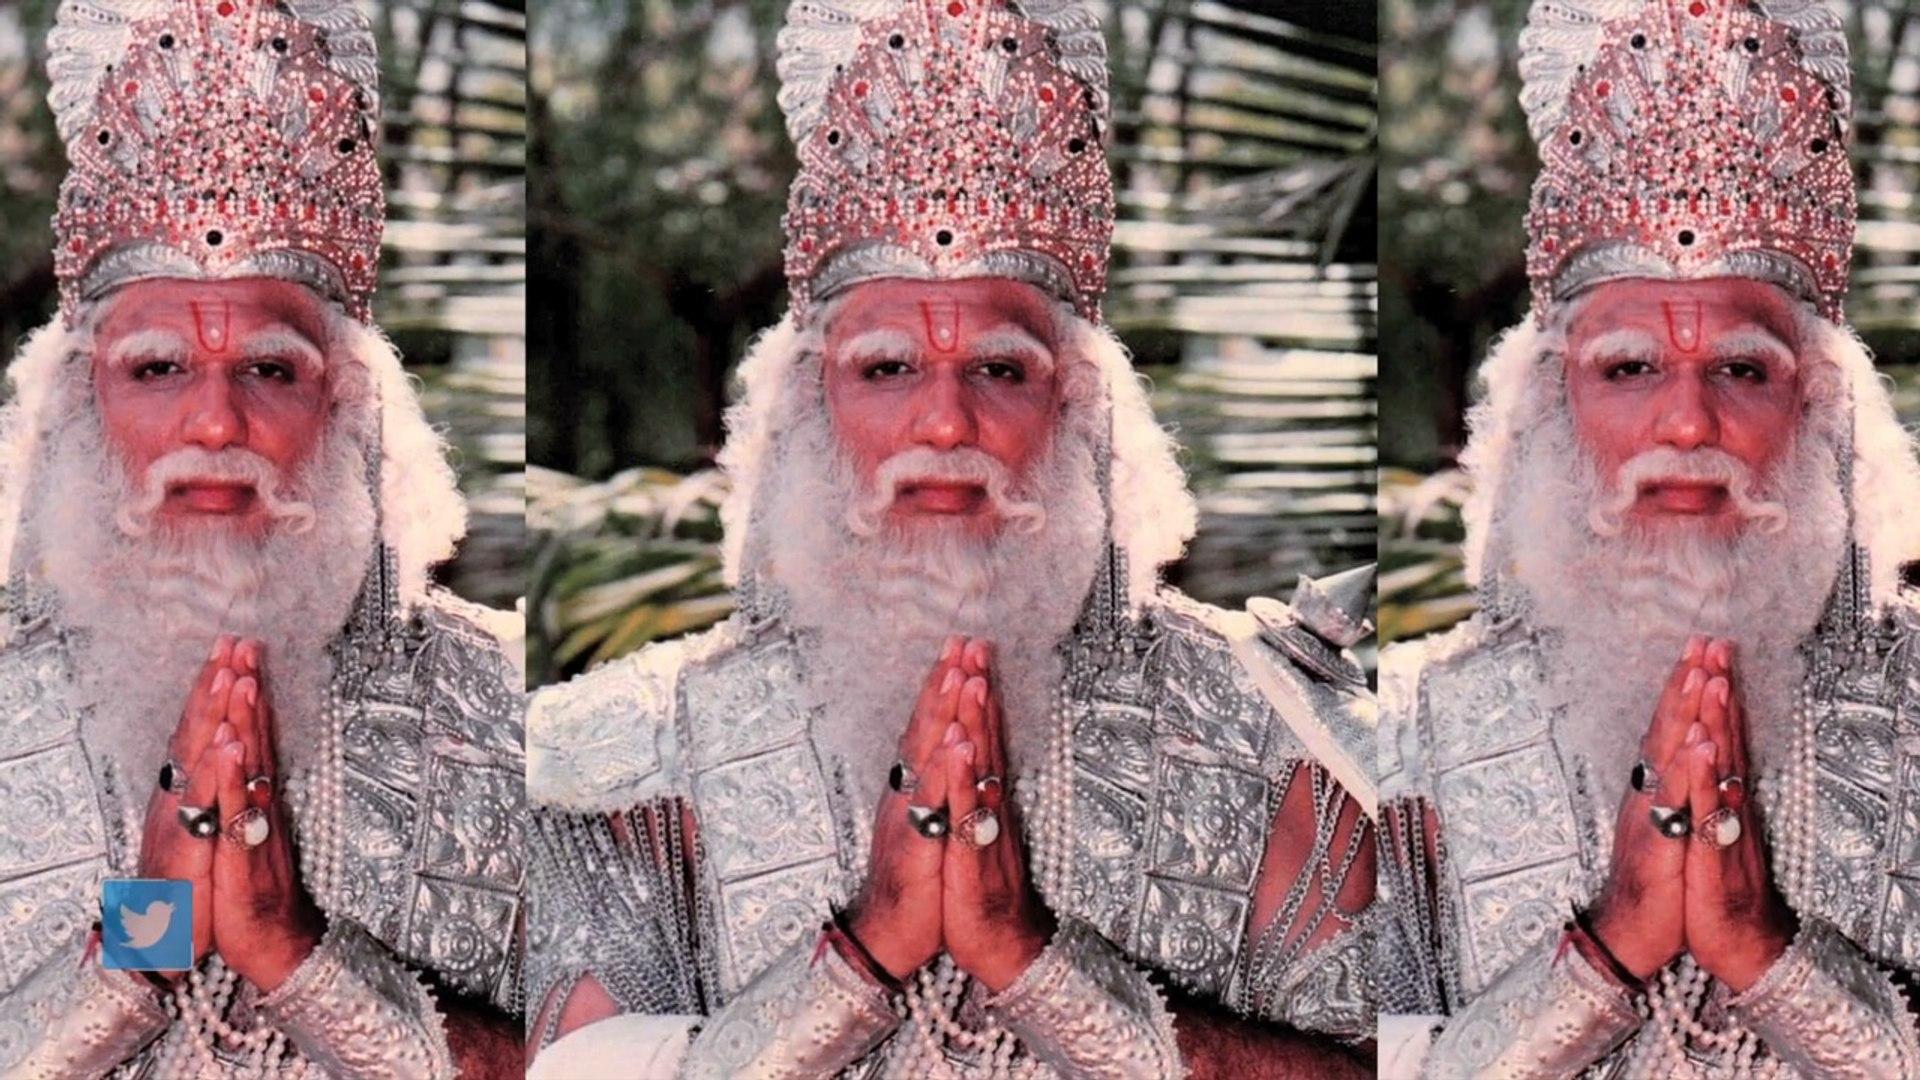 The Latest Bhishma Videos On Dailymotion